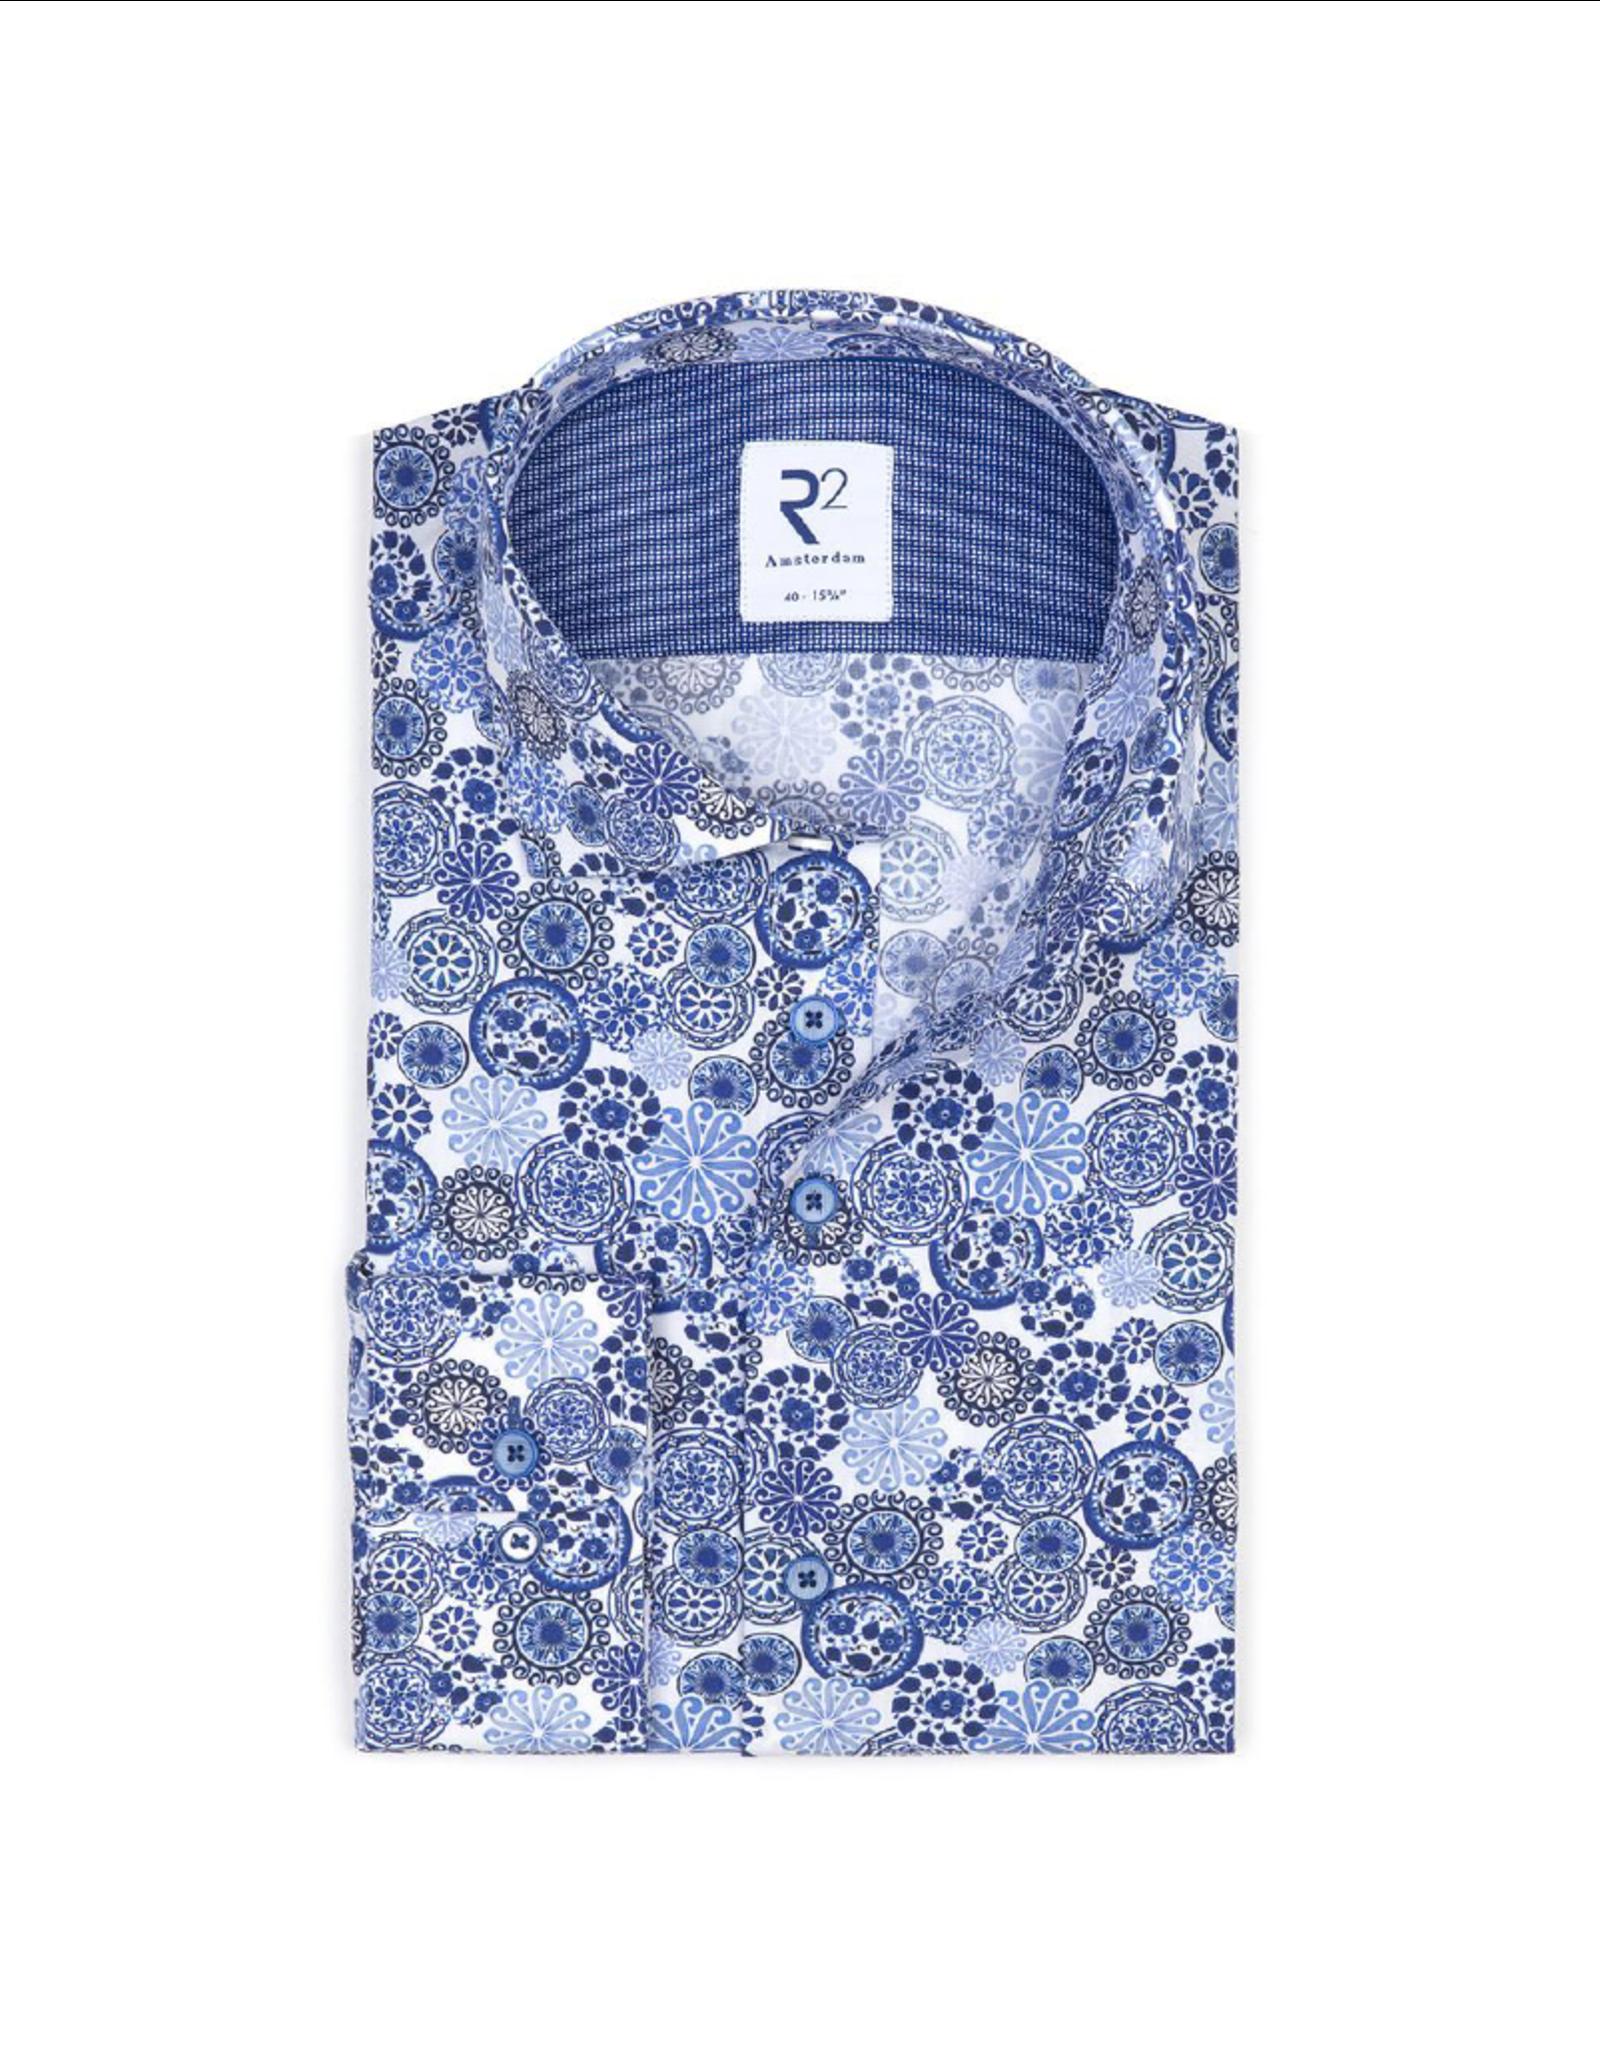 R2 Royal Blue Long-Sleeve Button Up Shirt